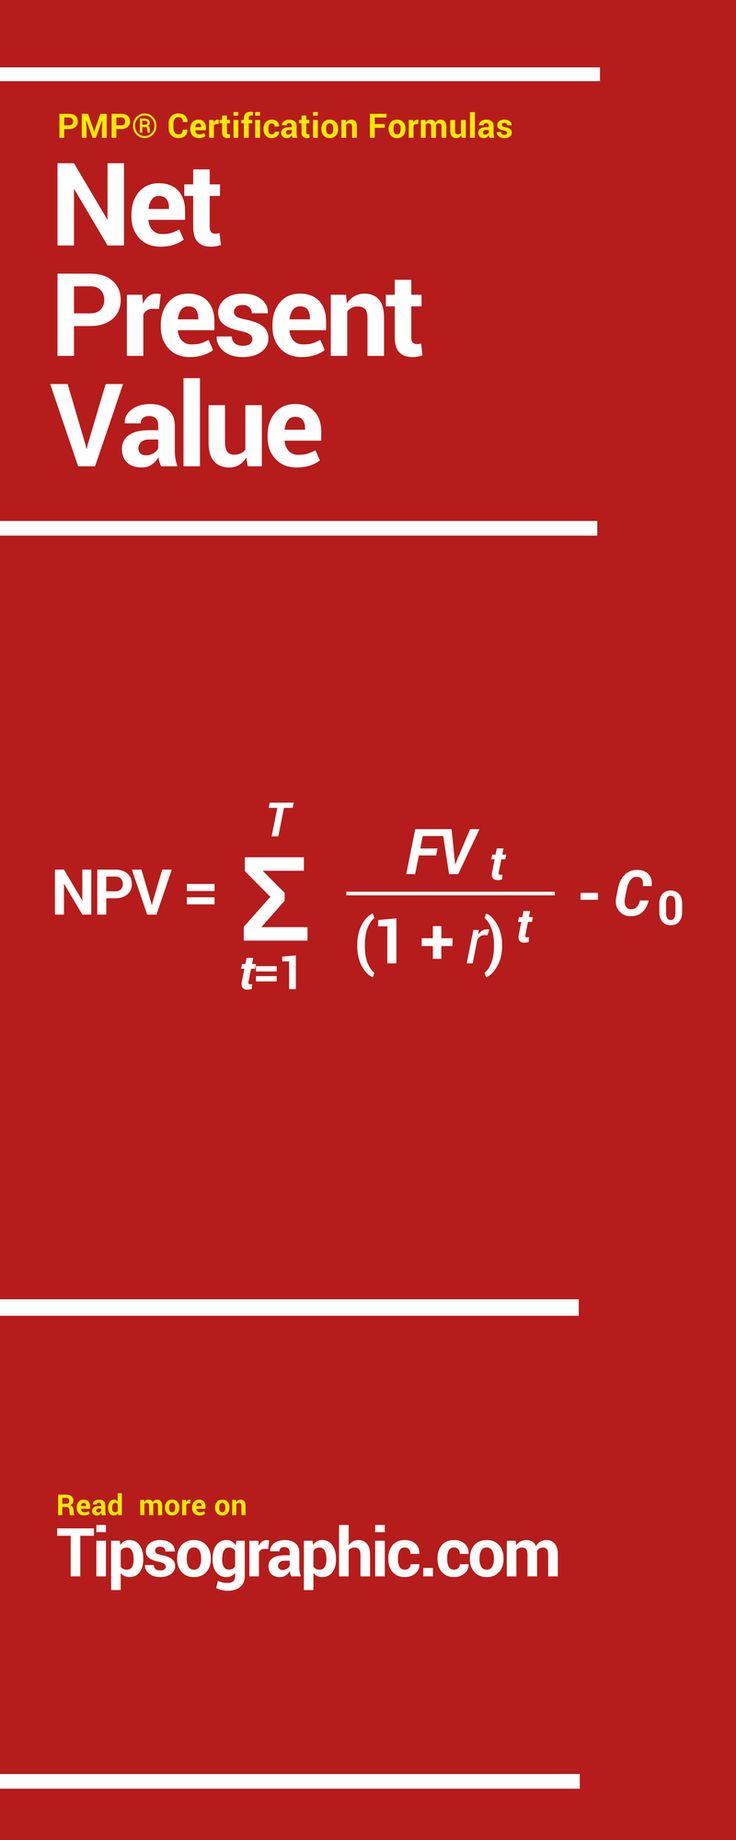 941 best projectmanagement images images on pinterest project pmp certification formulas net present value 1betcityfo Gallery